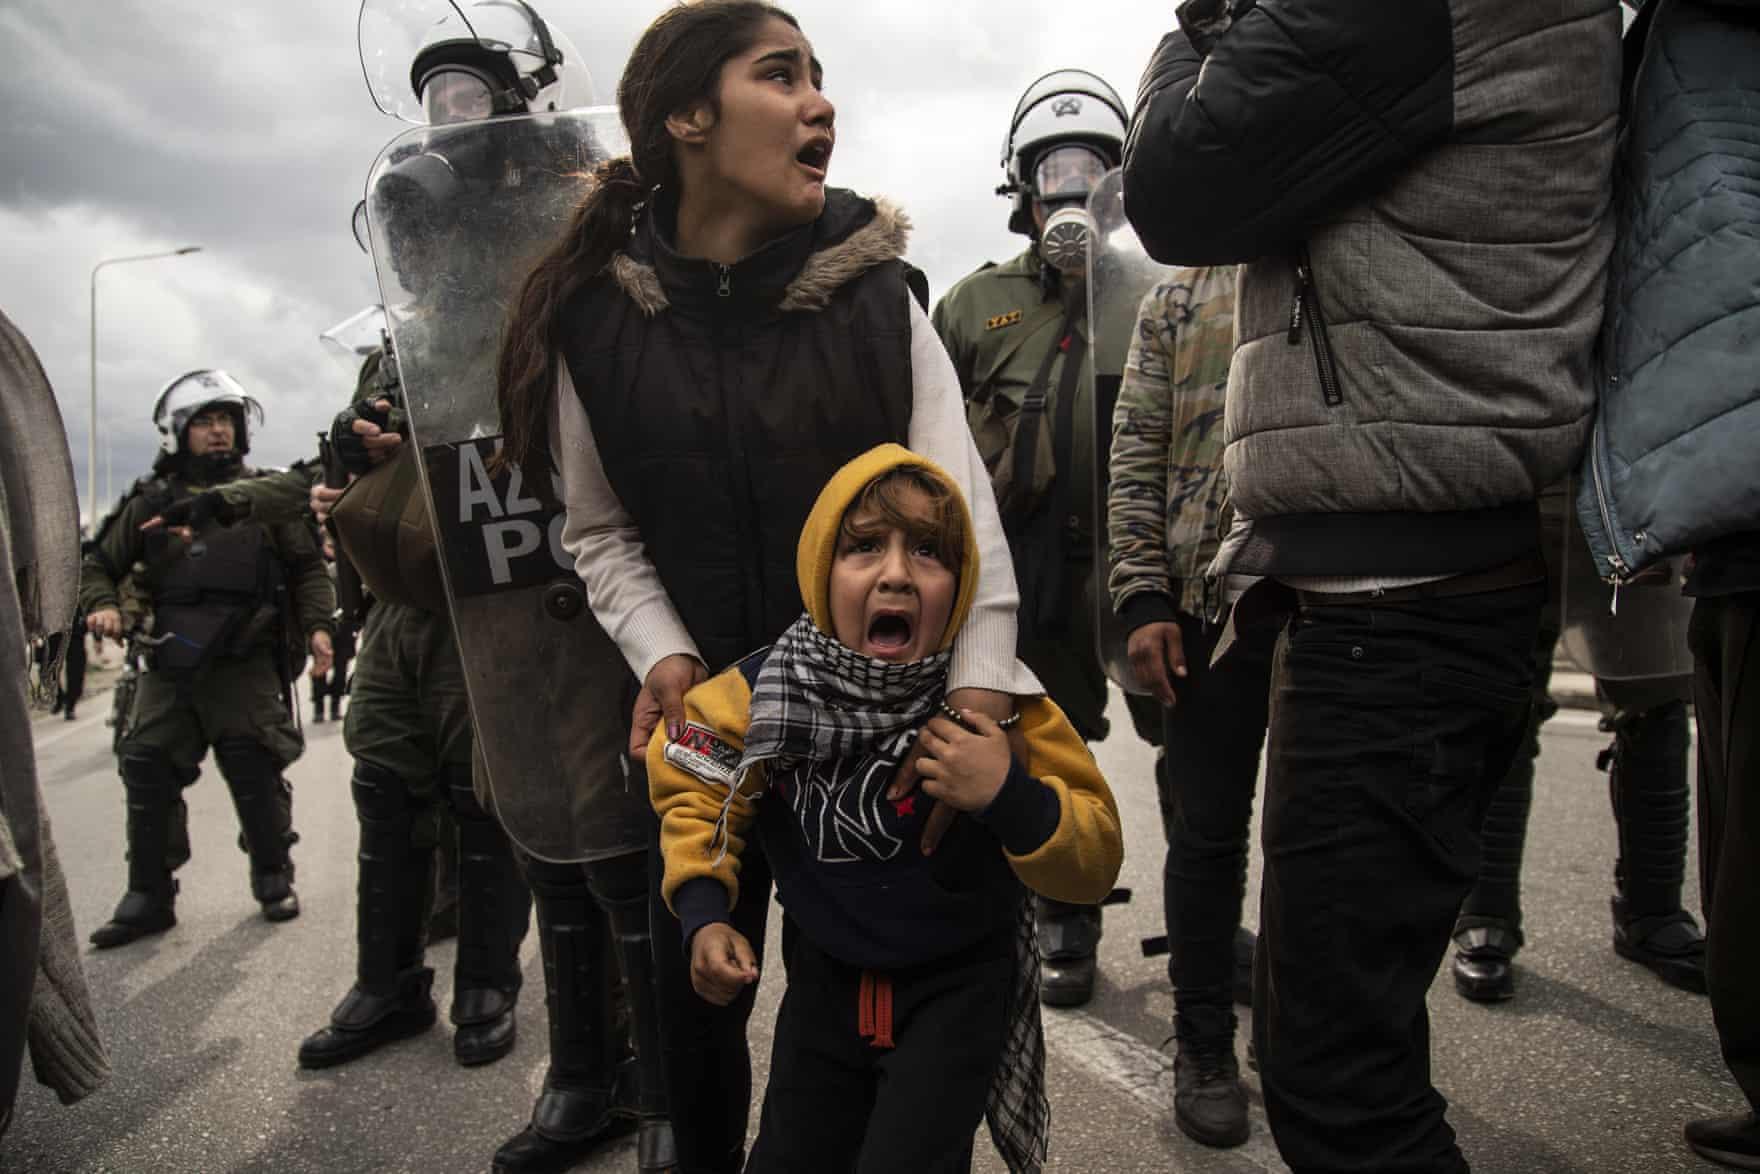 پلیس ضد شورش